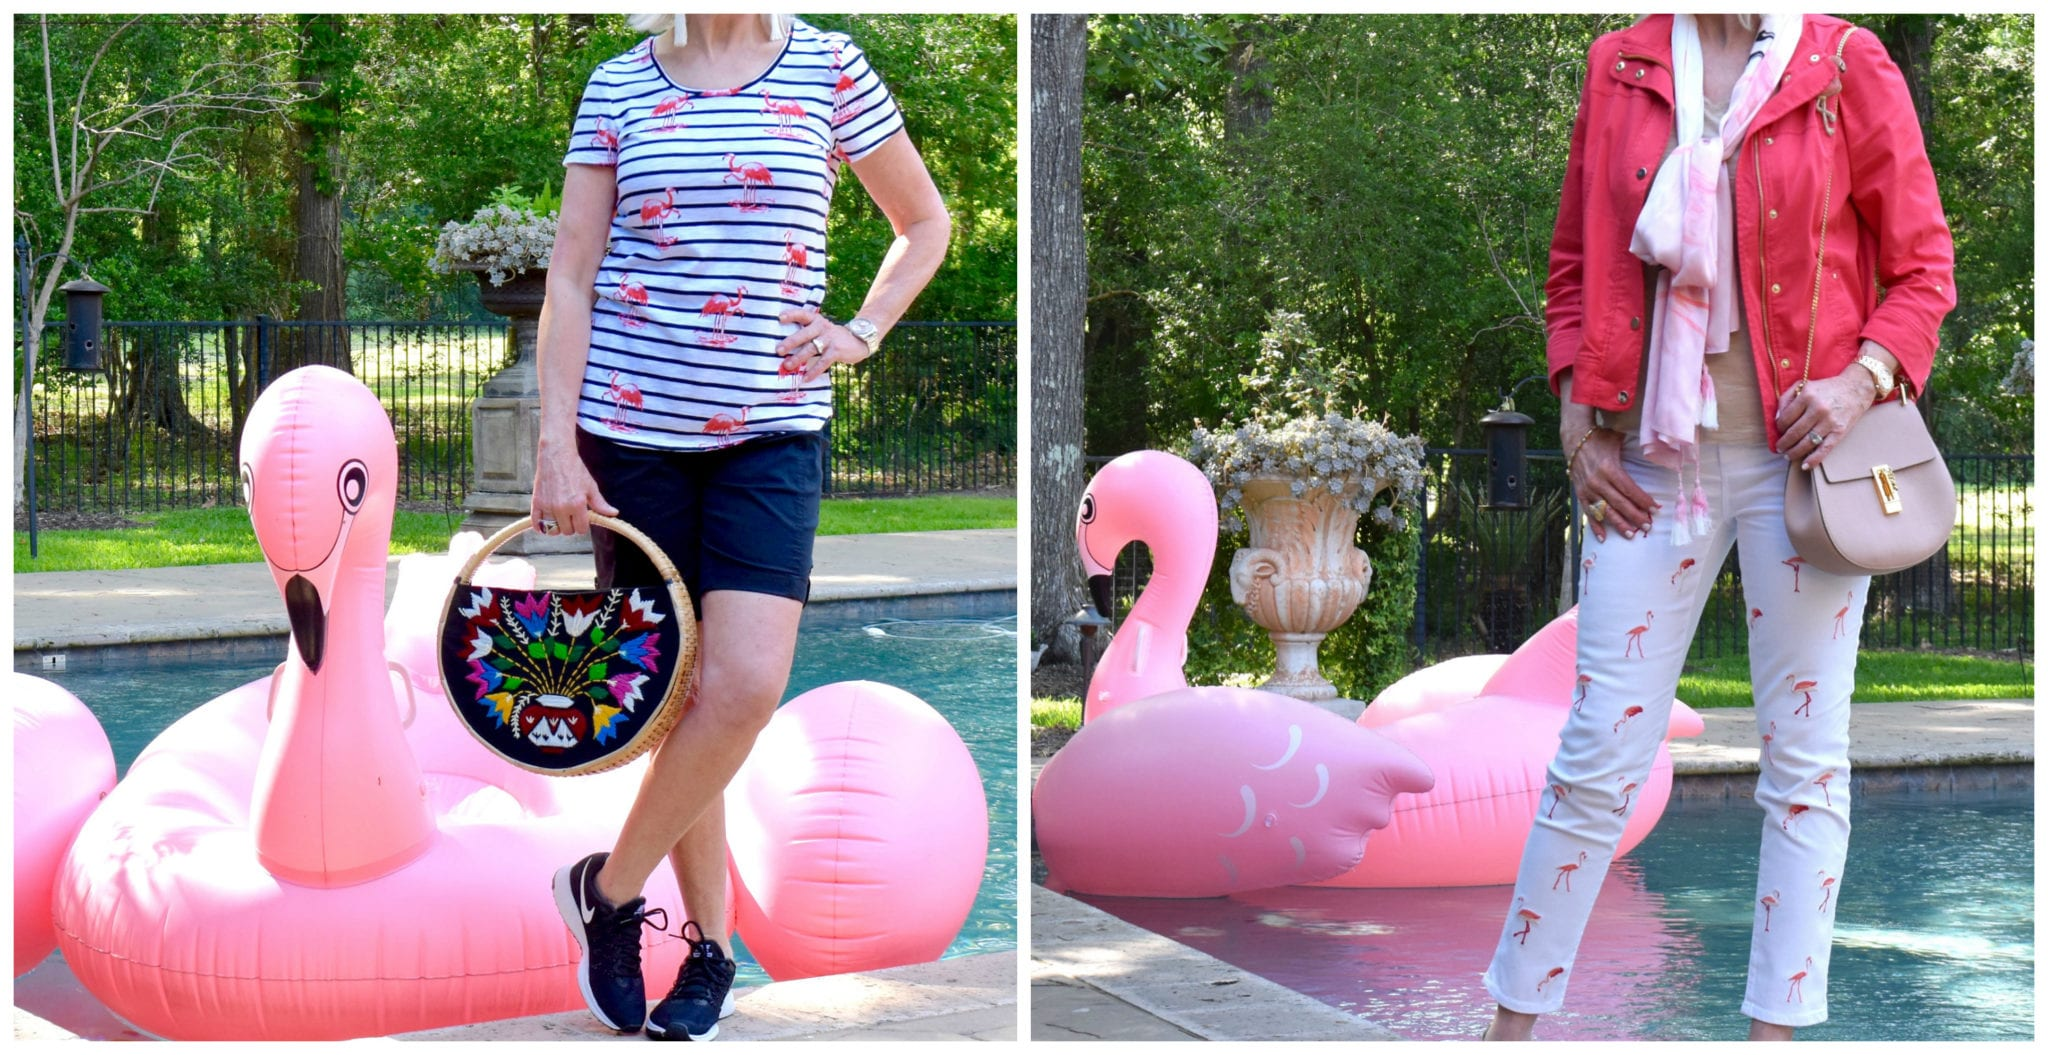 Flamingo Love | Shop Flamingo 3